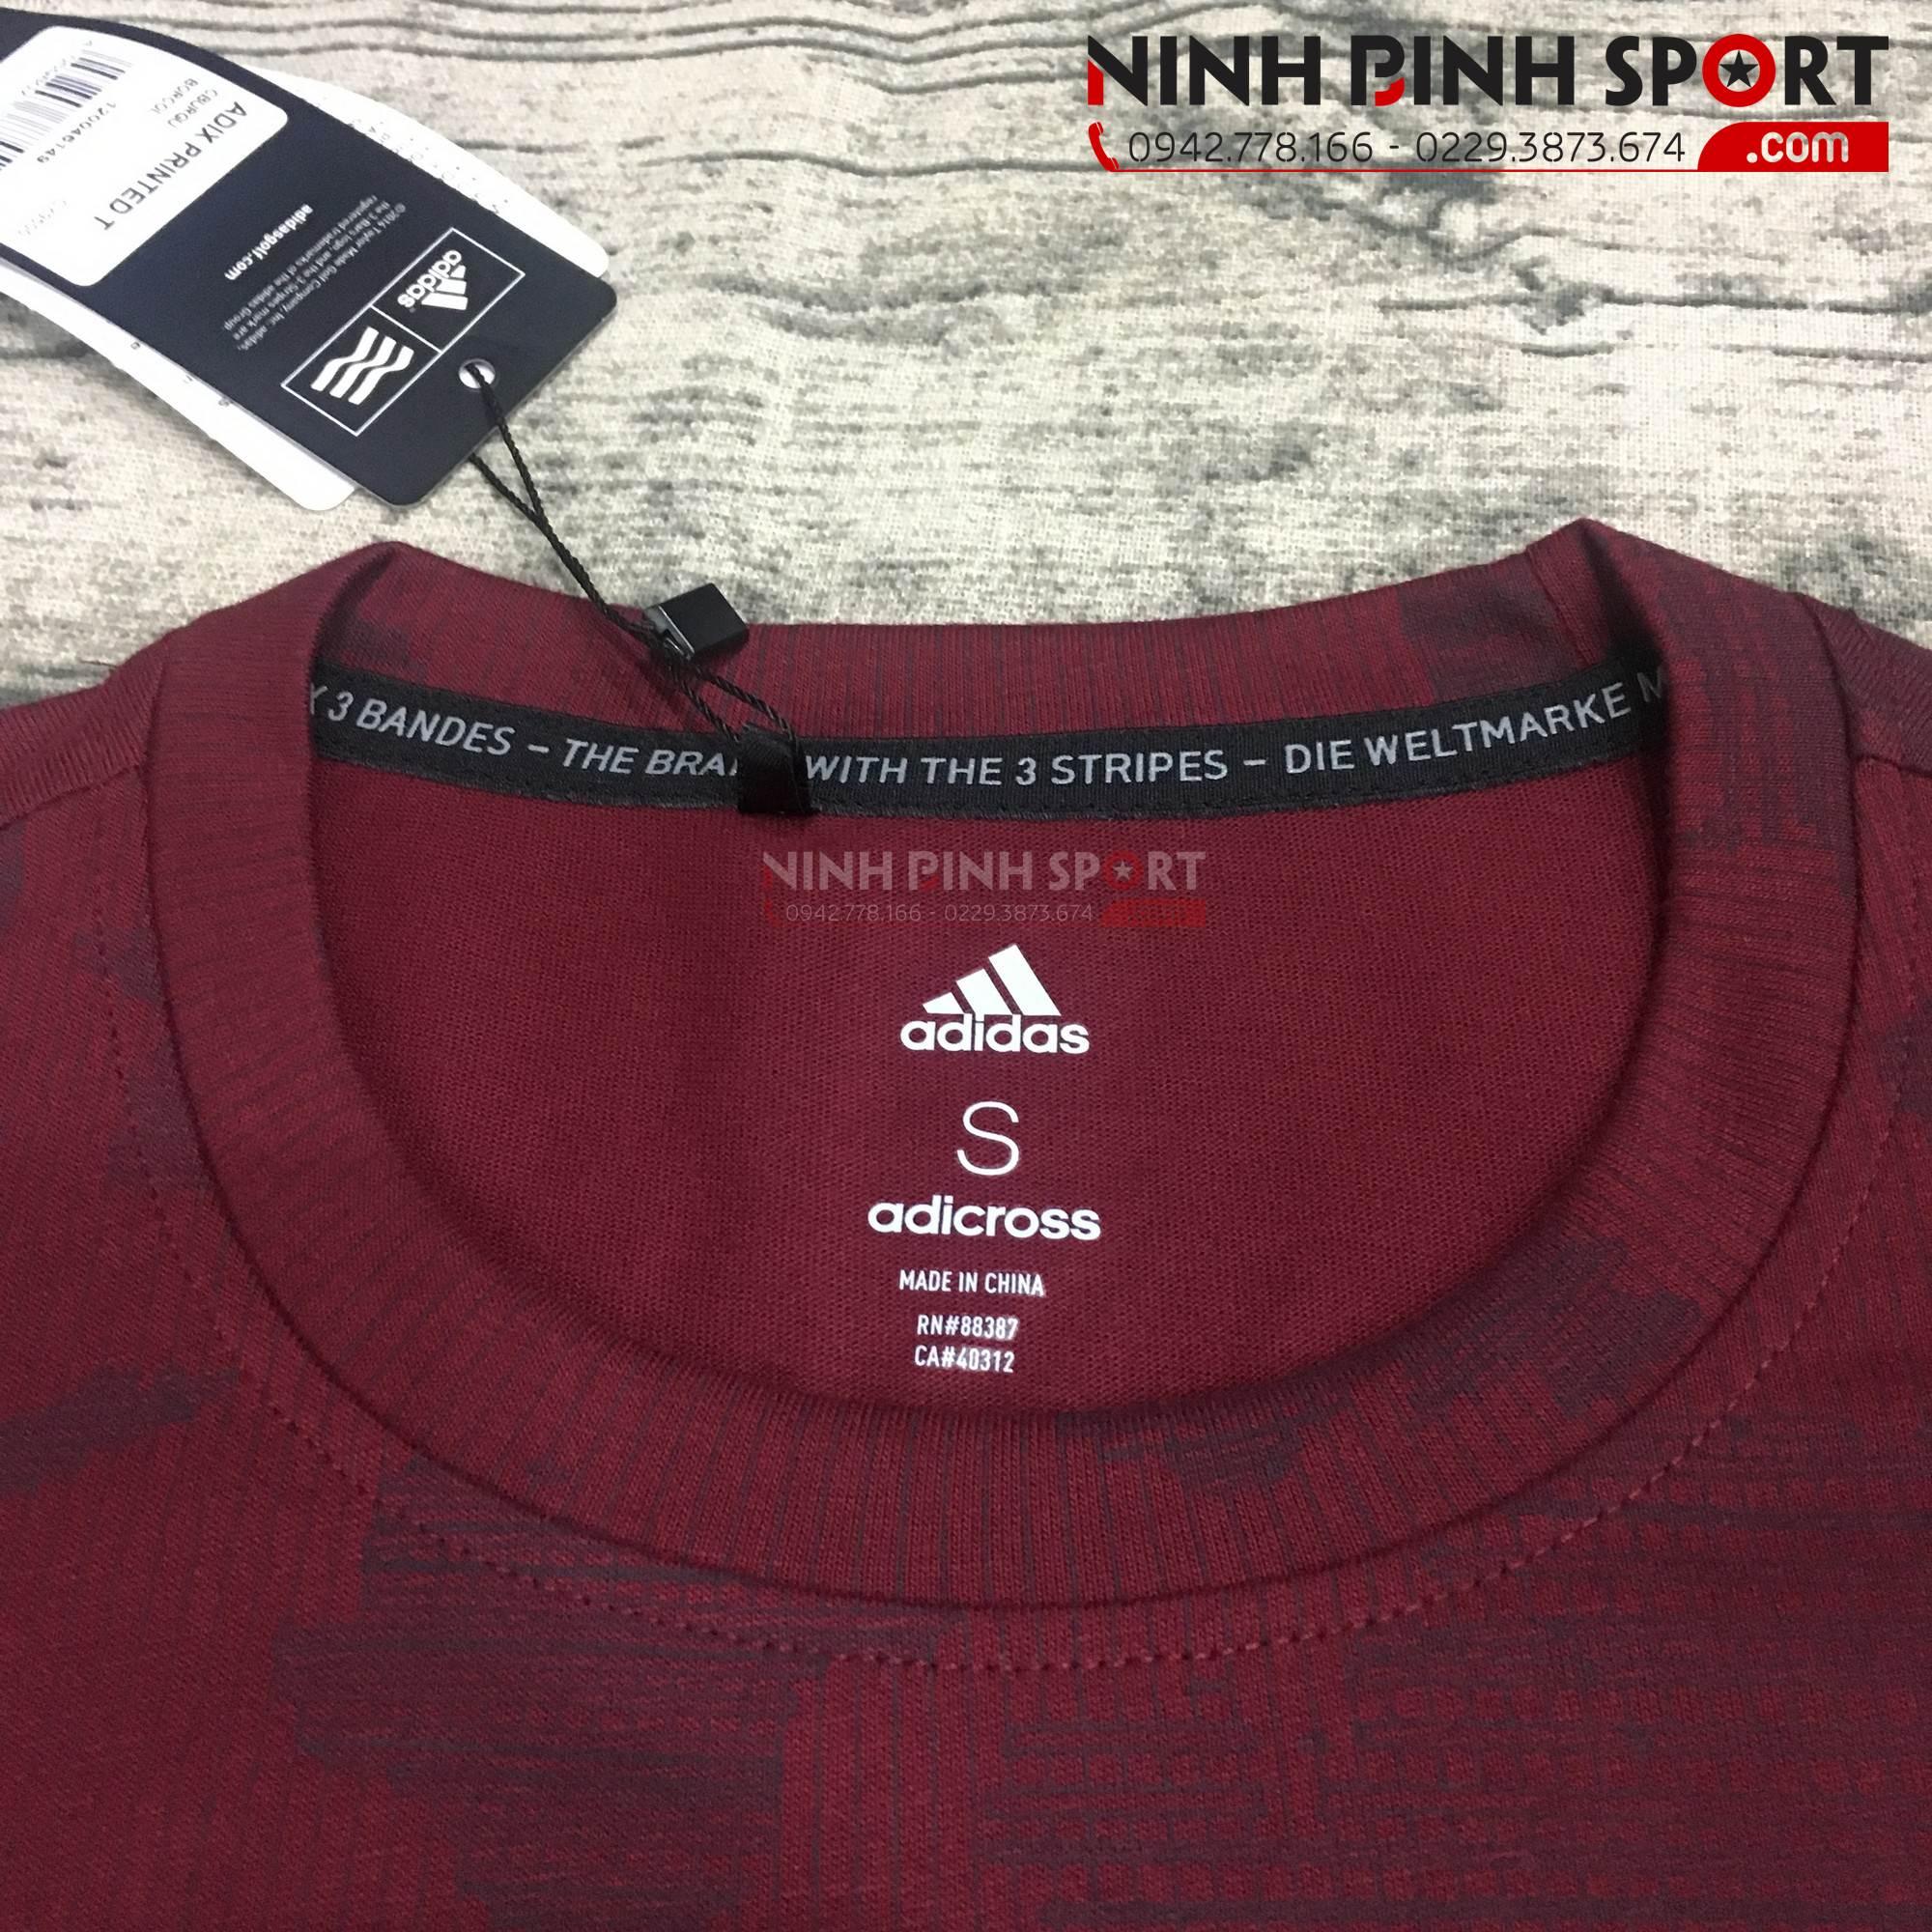 Áo thể thao nam Adidas Adicross Graphic Tee Collegiate Burgundy CY9500